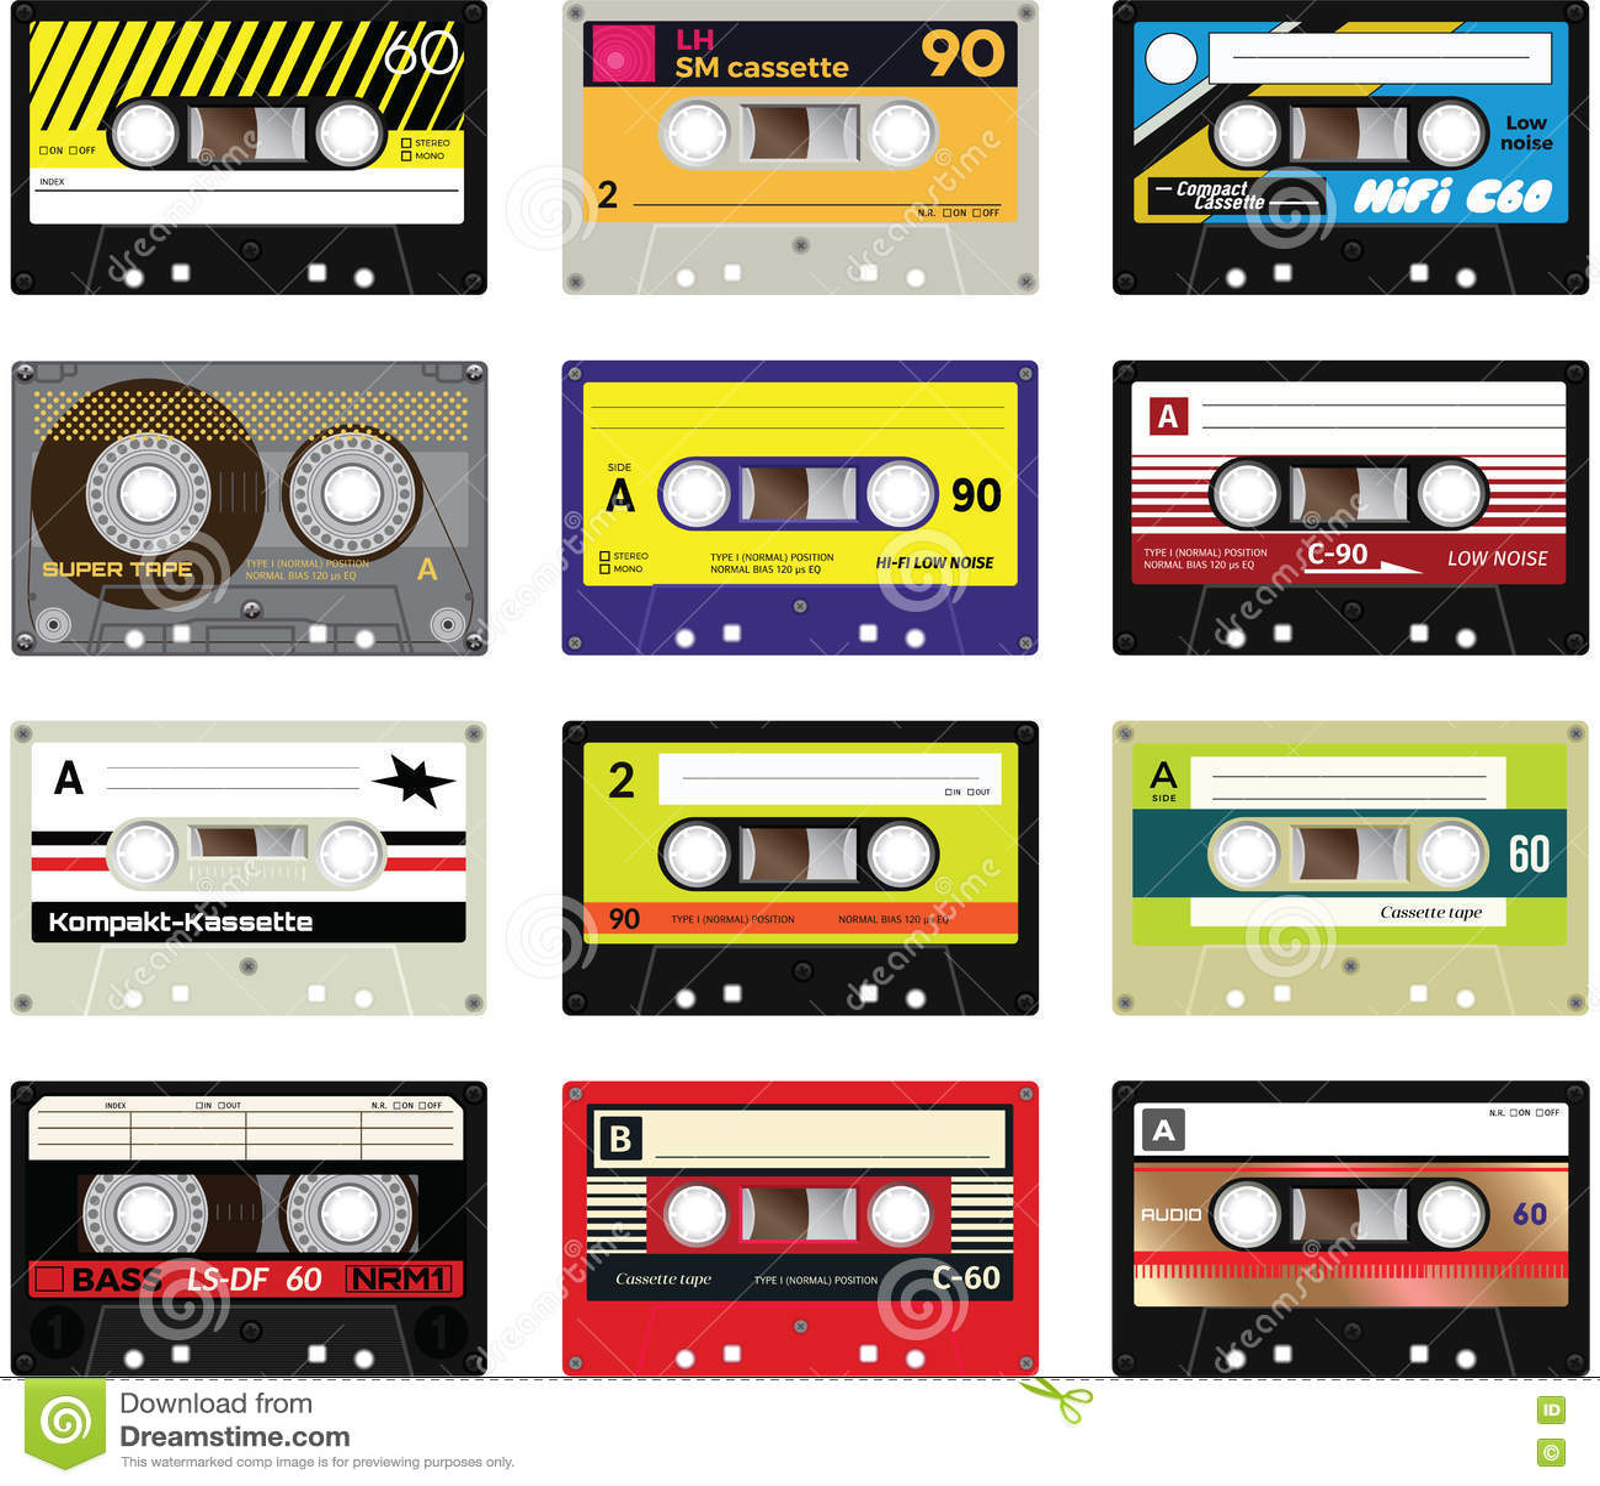 You let vintage cassette tapes lady,but